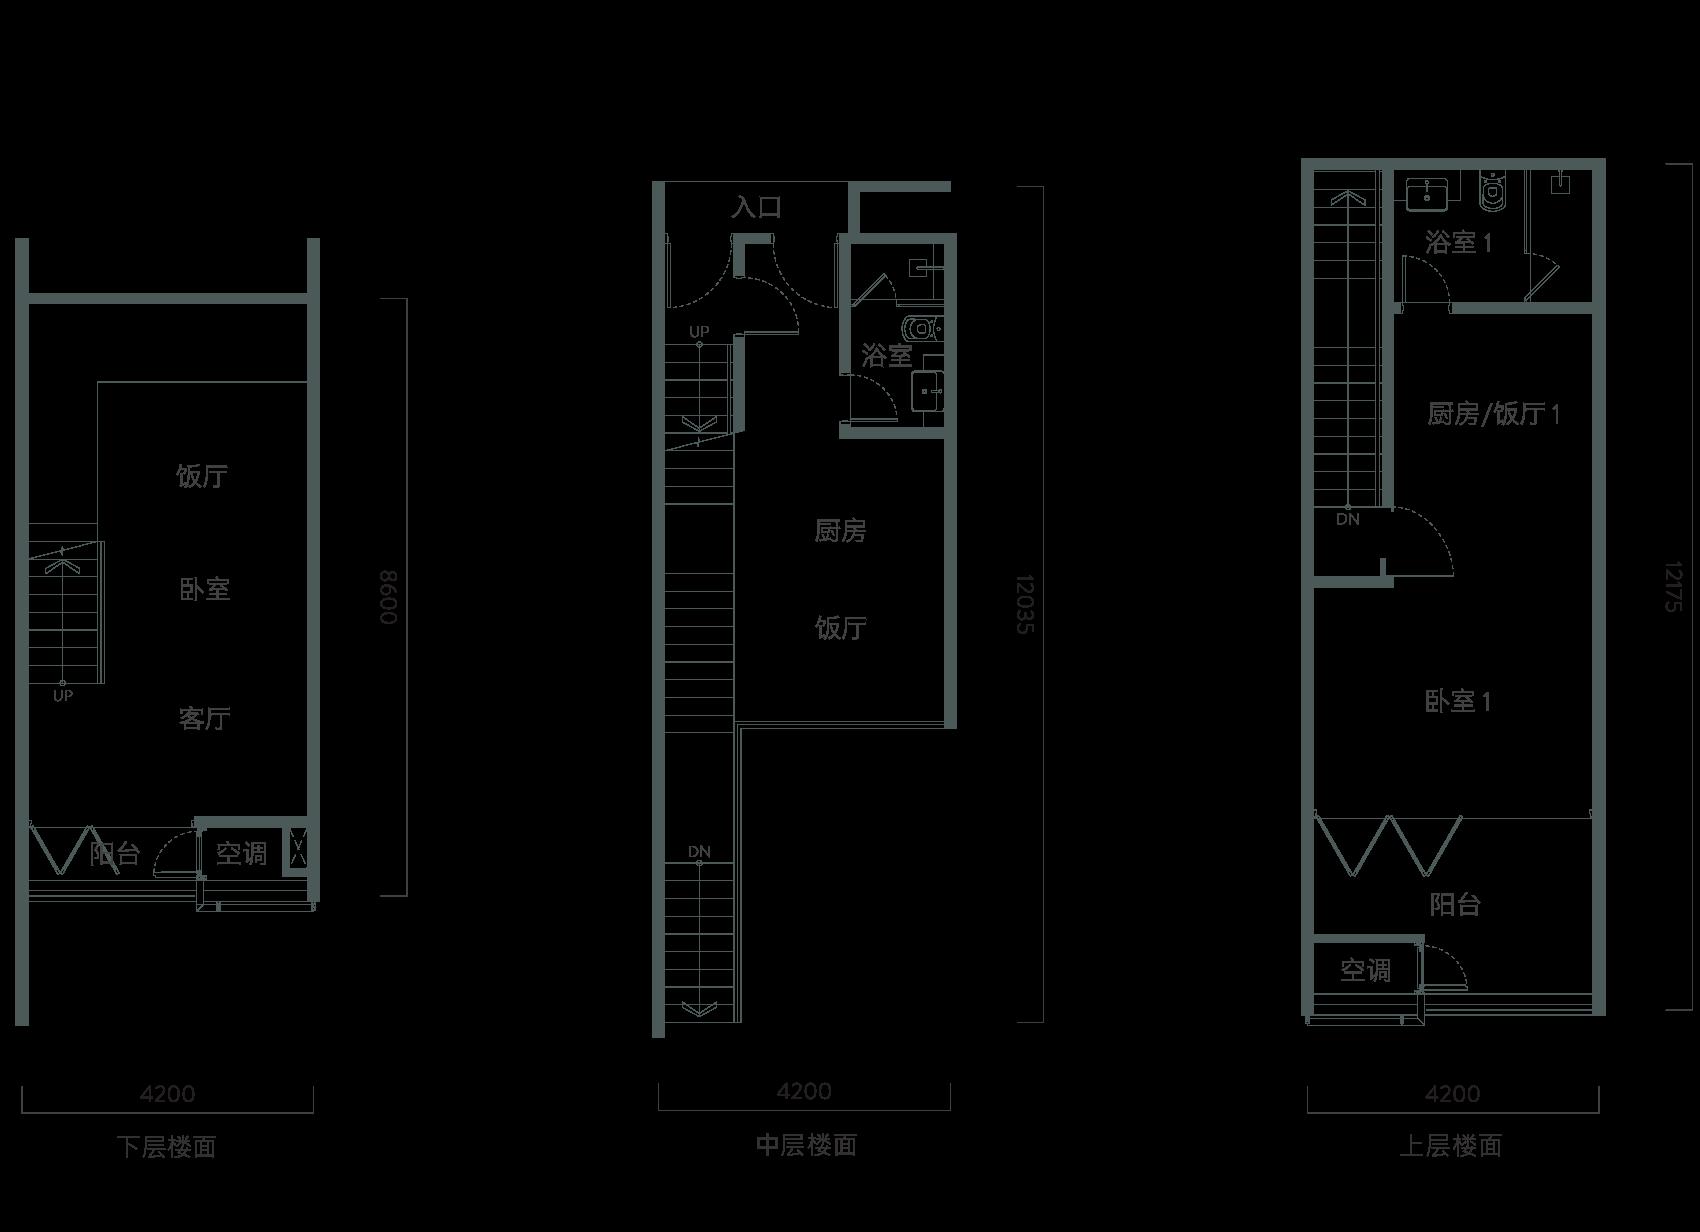 TS3 Floorplan